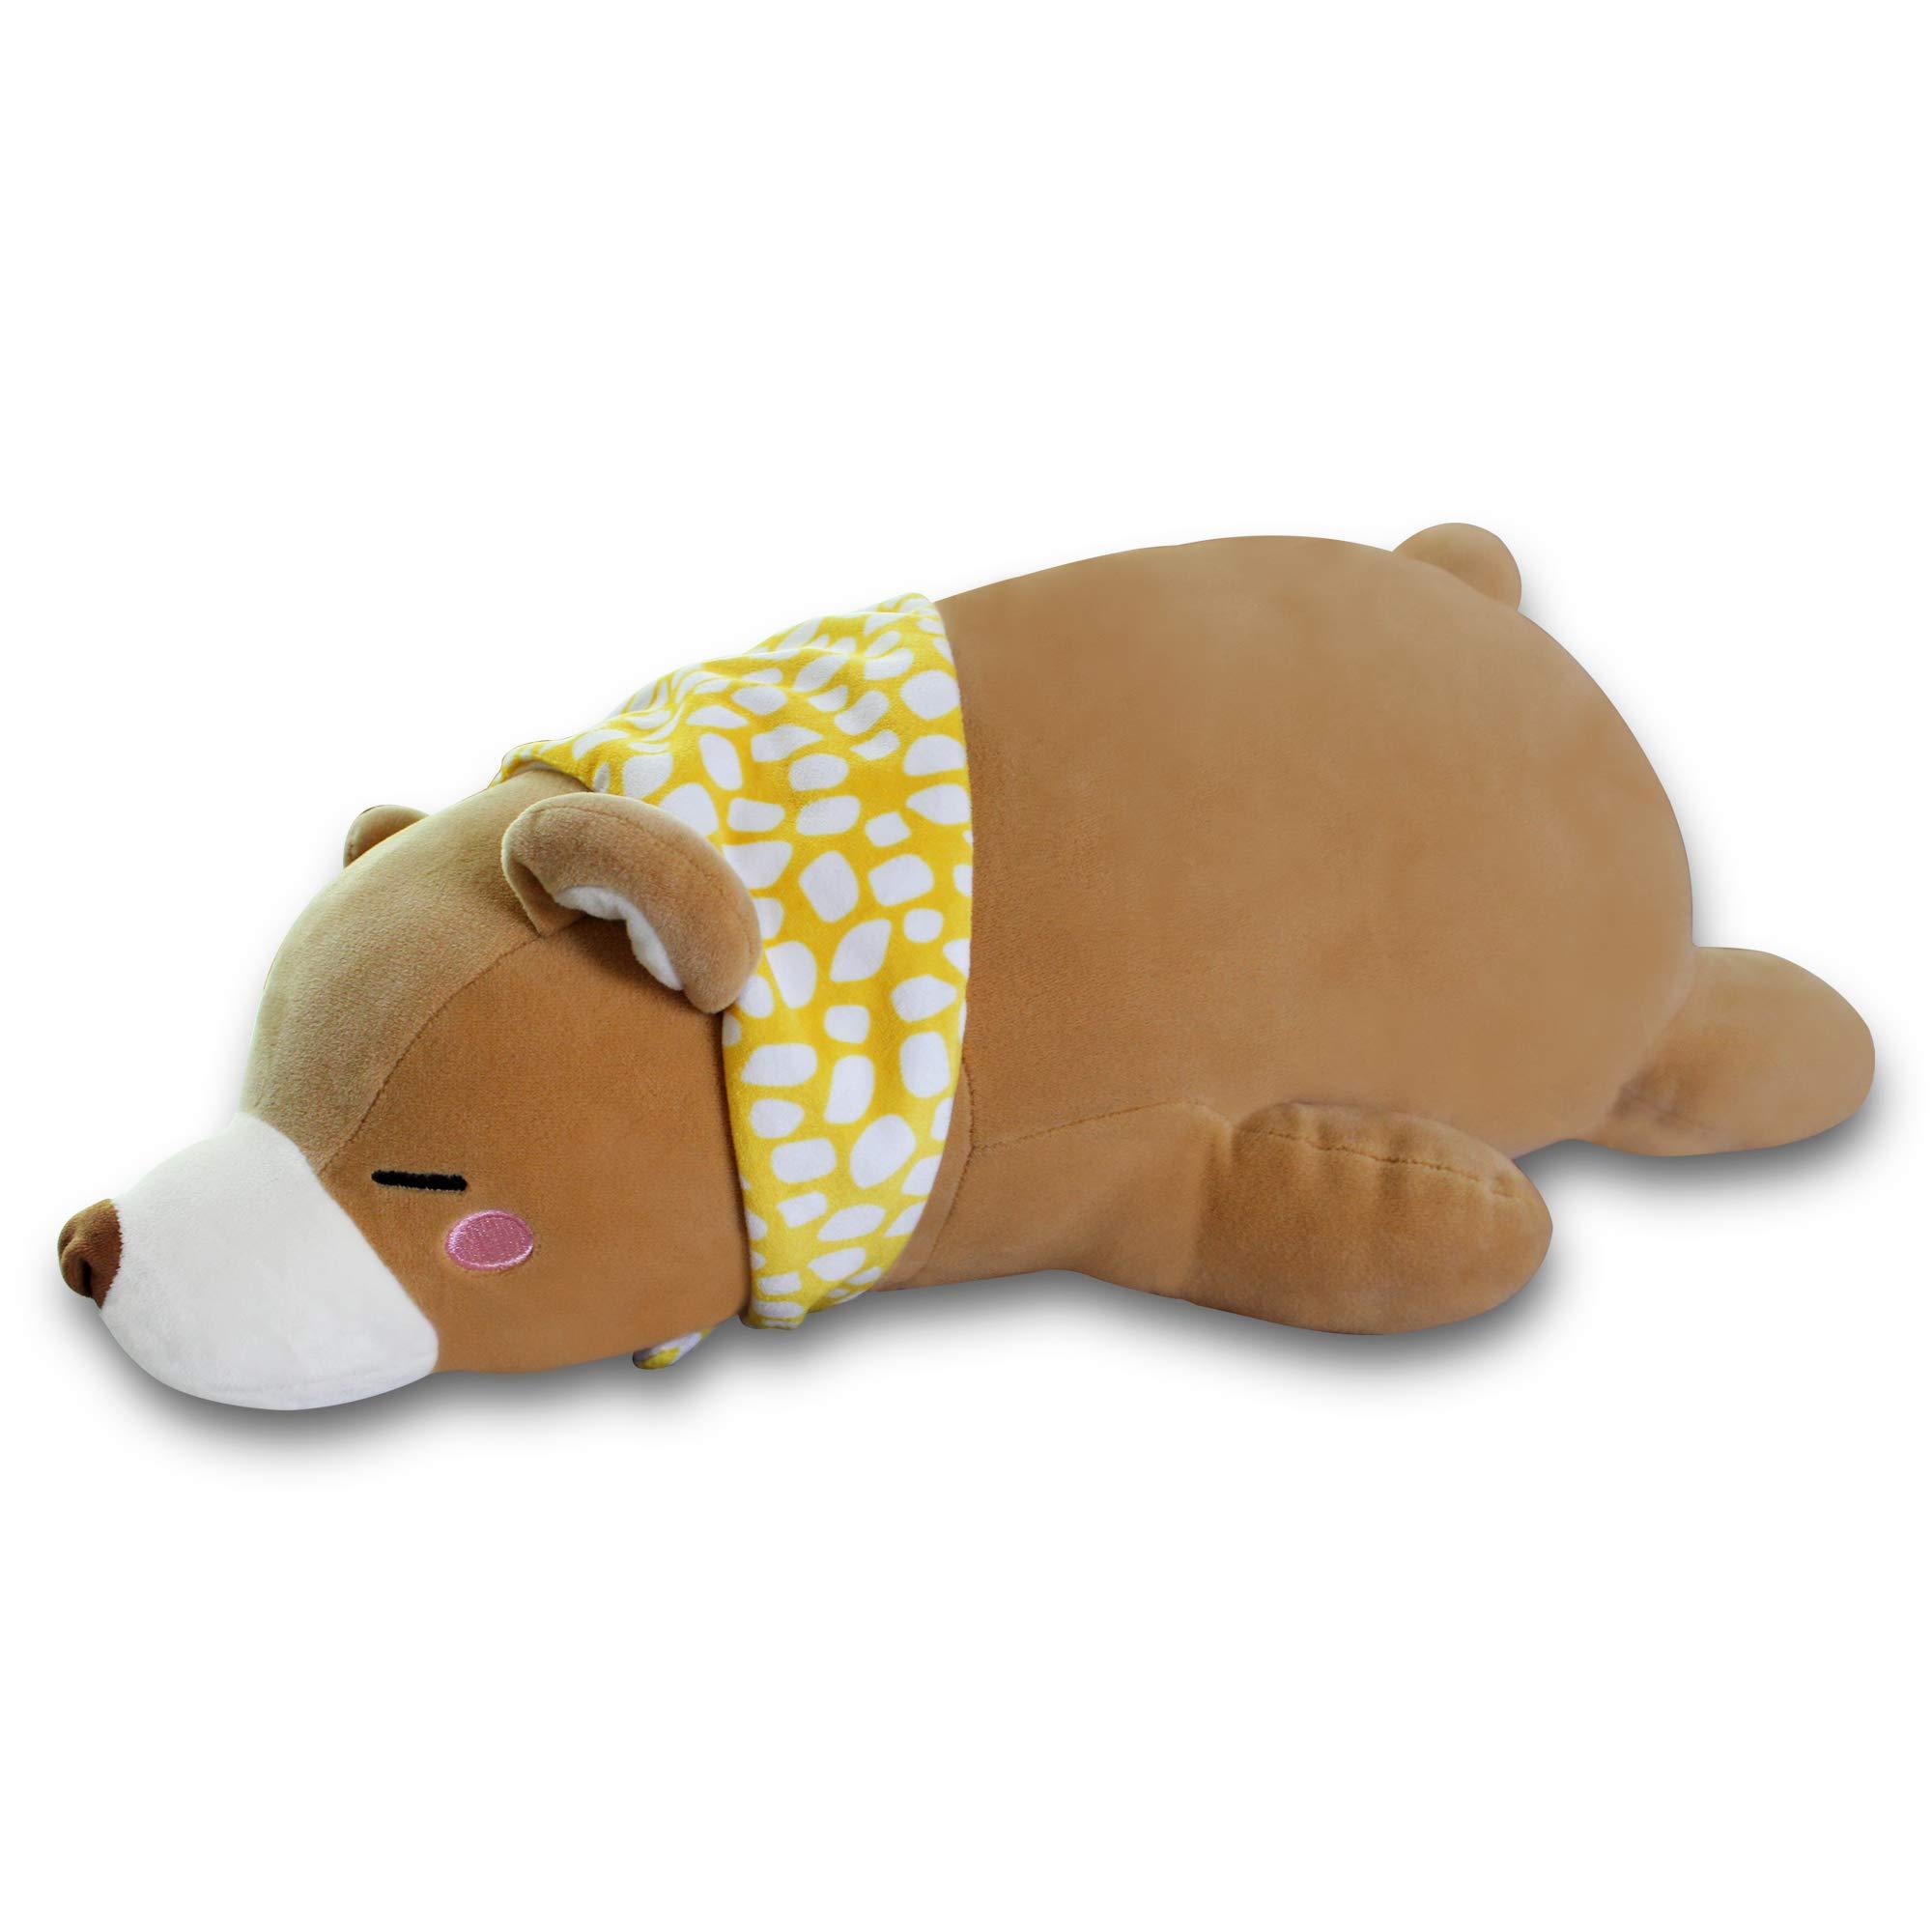 LazyPetz LazyBear, Plush, Stuffed Animal (20'', 50cm) by LazyPetz